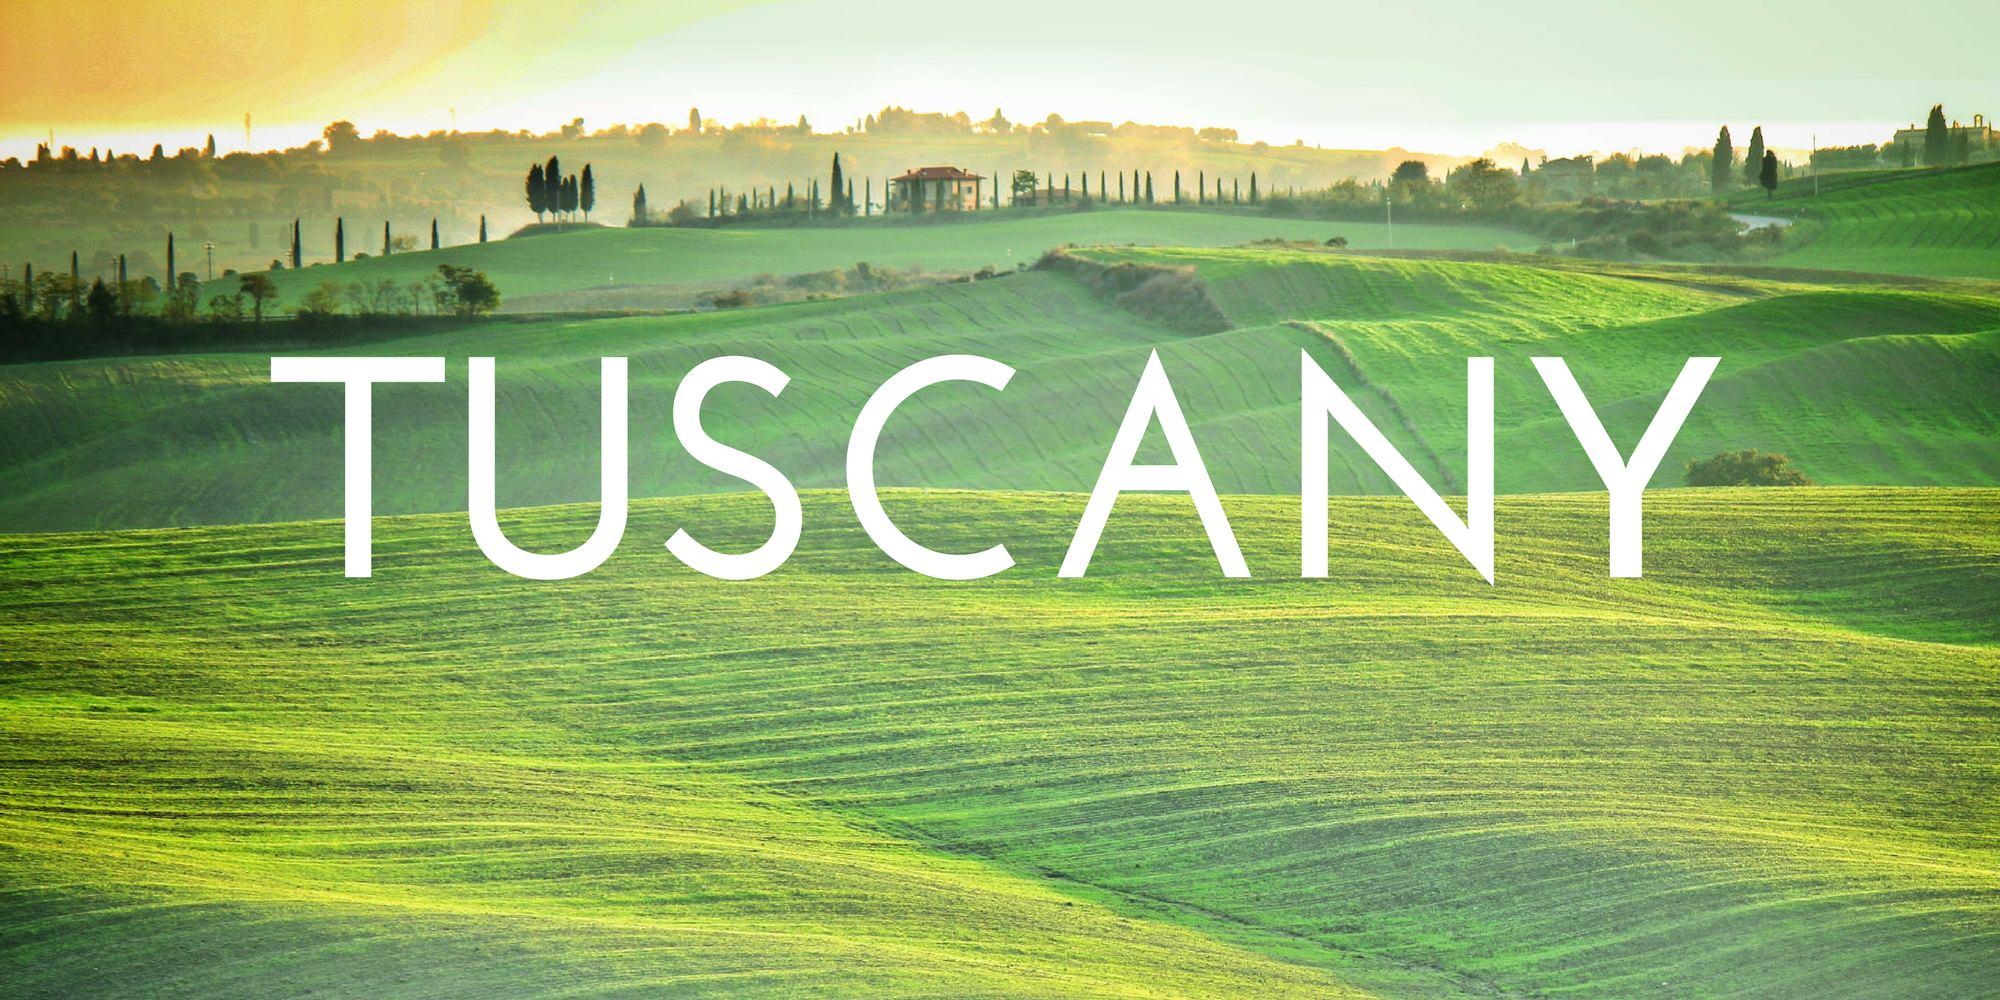 Tuscany - Authentic Traveling - Header